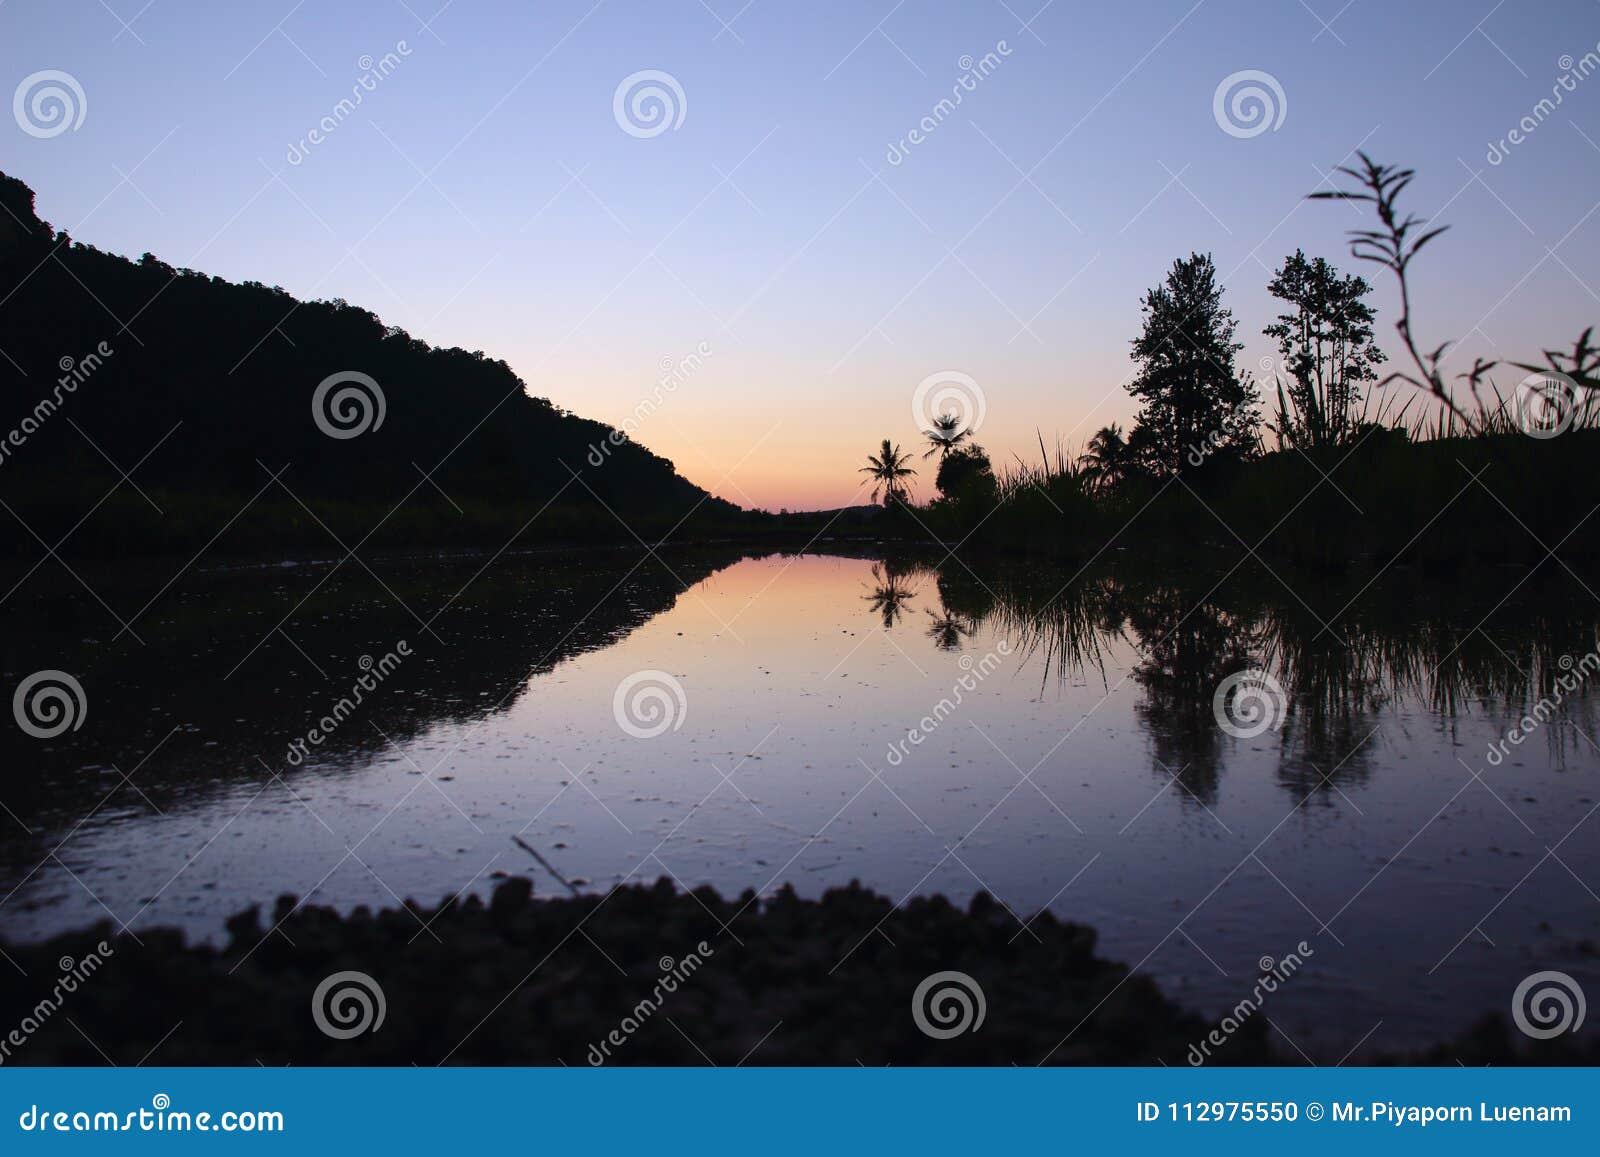 sunset, landscape, beautifull in nature.